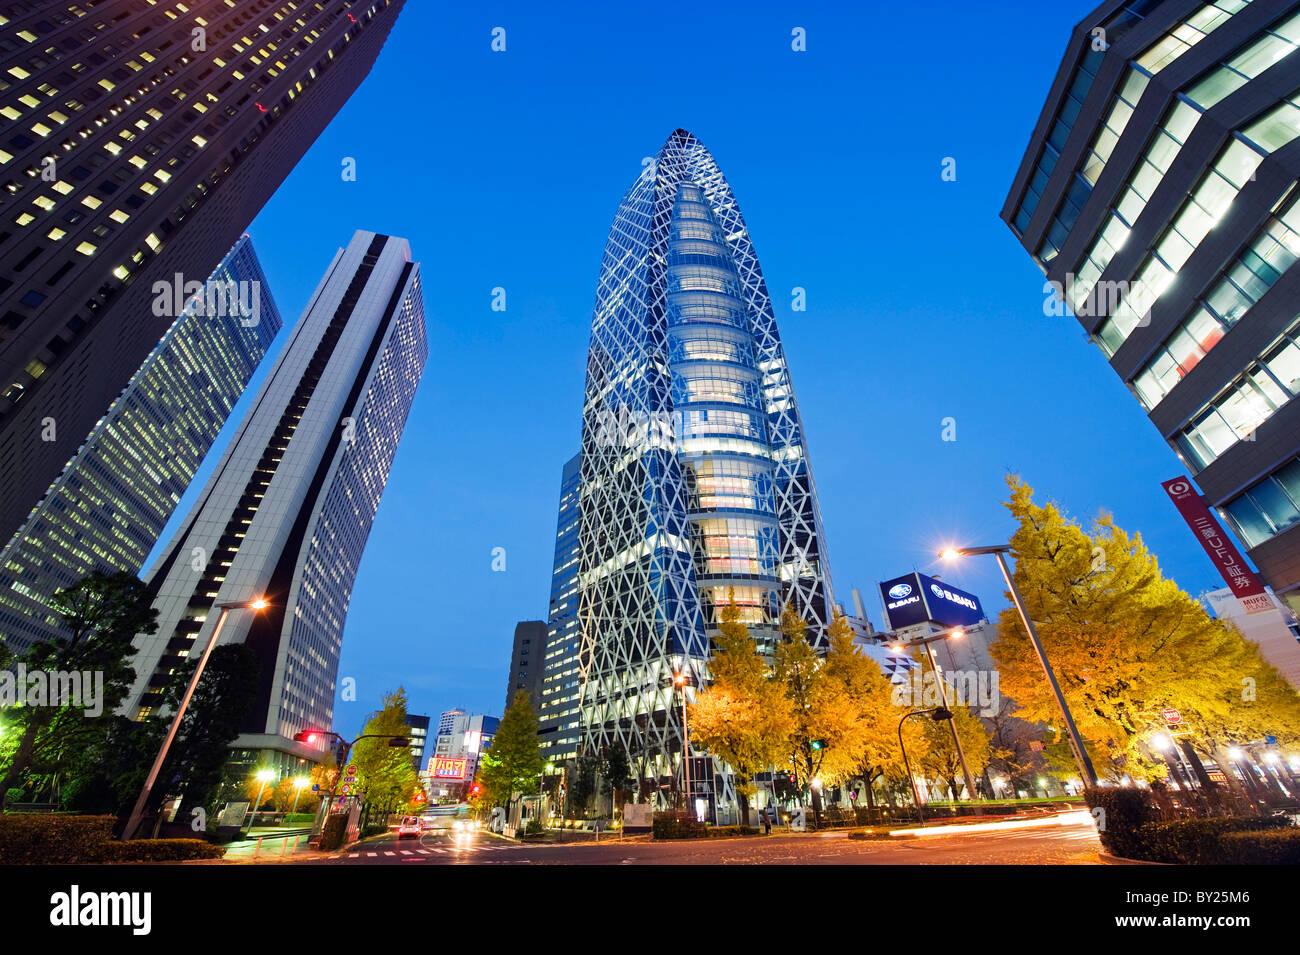 Asia, Giappone, Tokyo Shinjuku, Tokyo Mode Gakuen Cocoon Tower, Design edificio scolastico Foto Stock